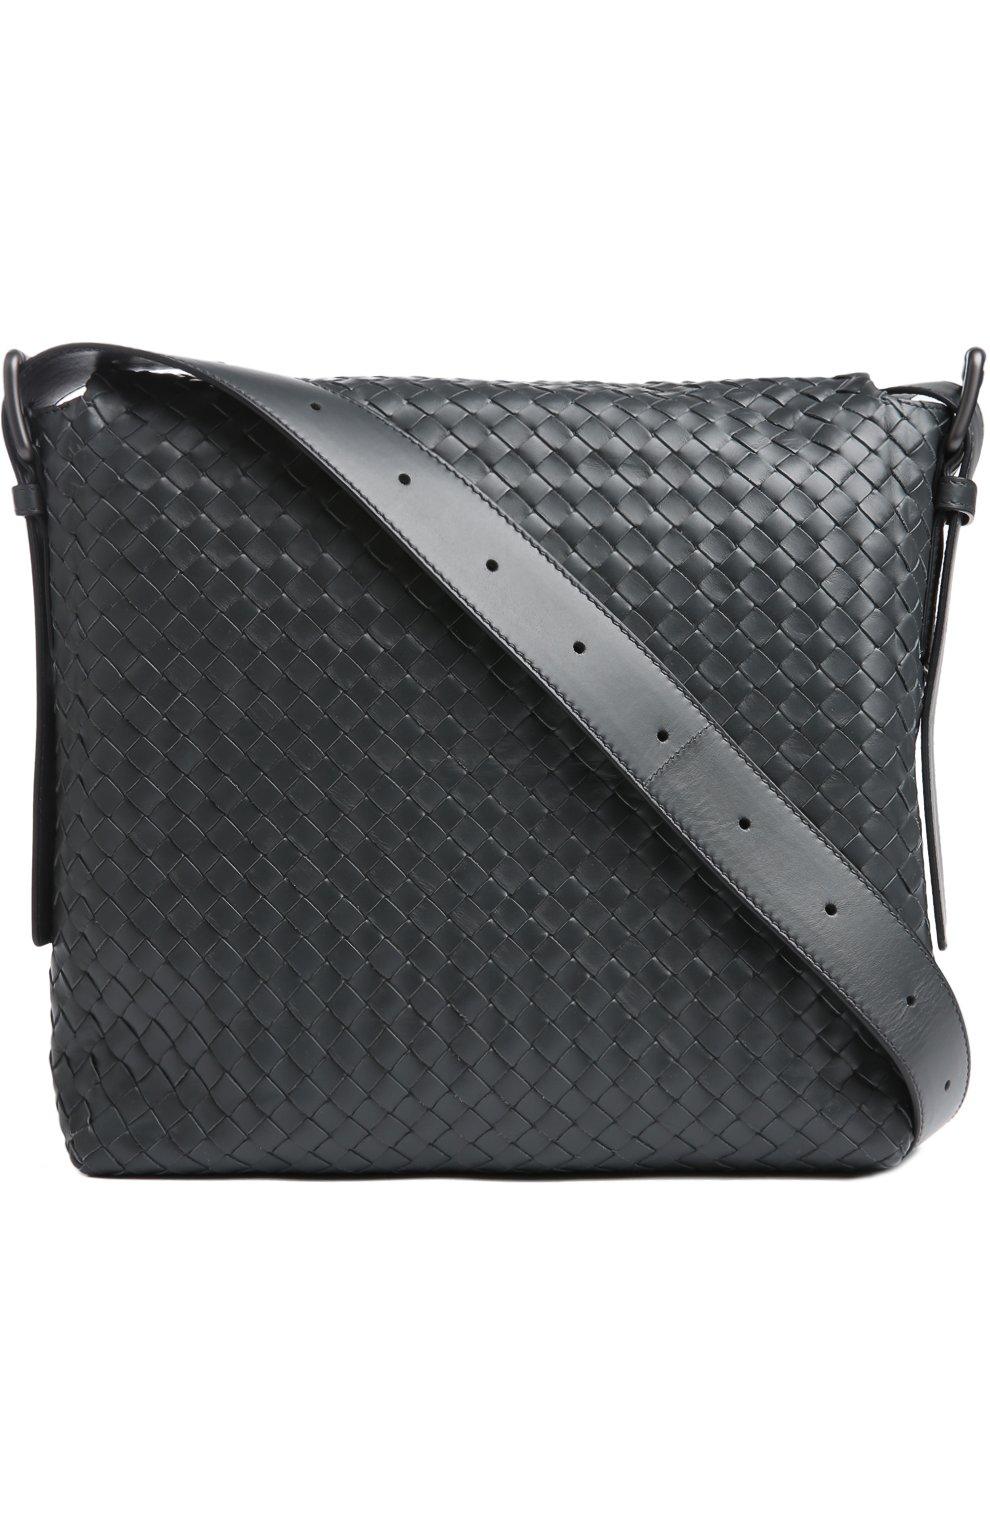 856db70f24d4 Мужские сумки Bottega Veneta по цене от 36 800 руб. купить в  интернет-магазине ЦУМ